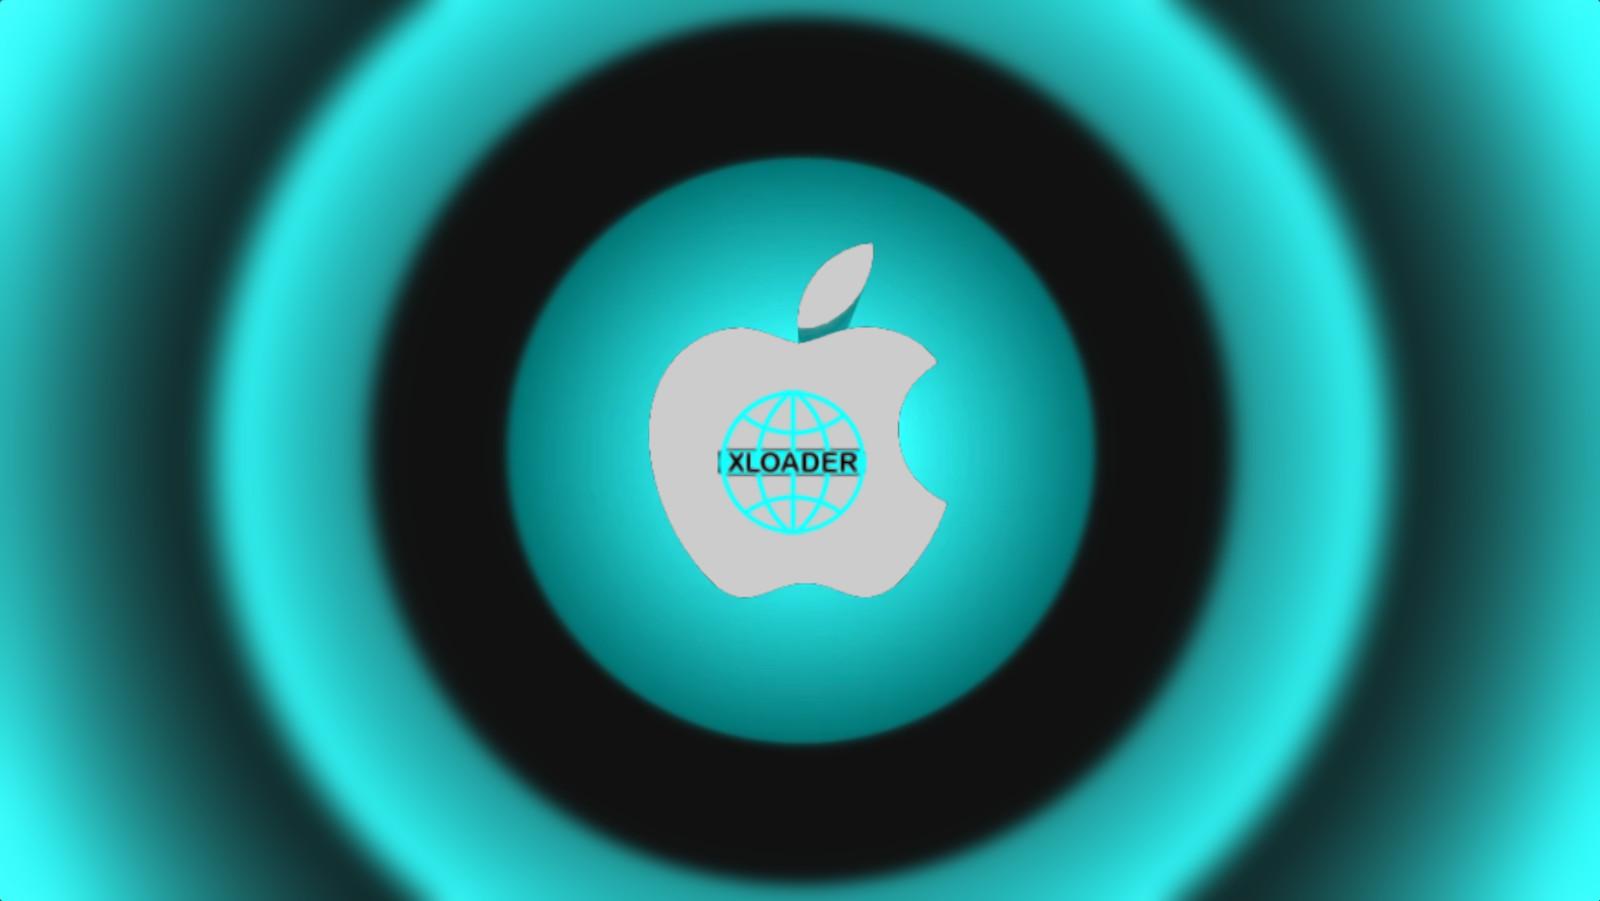 XLoader 信息竊取器針對 macOS 系統